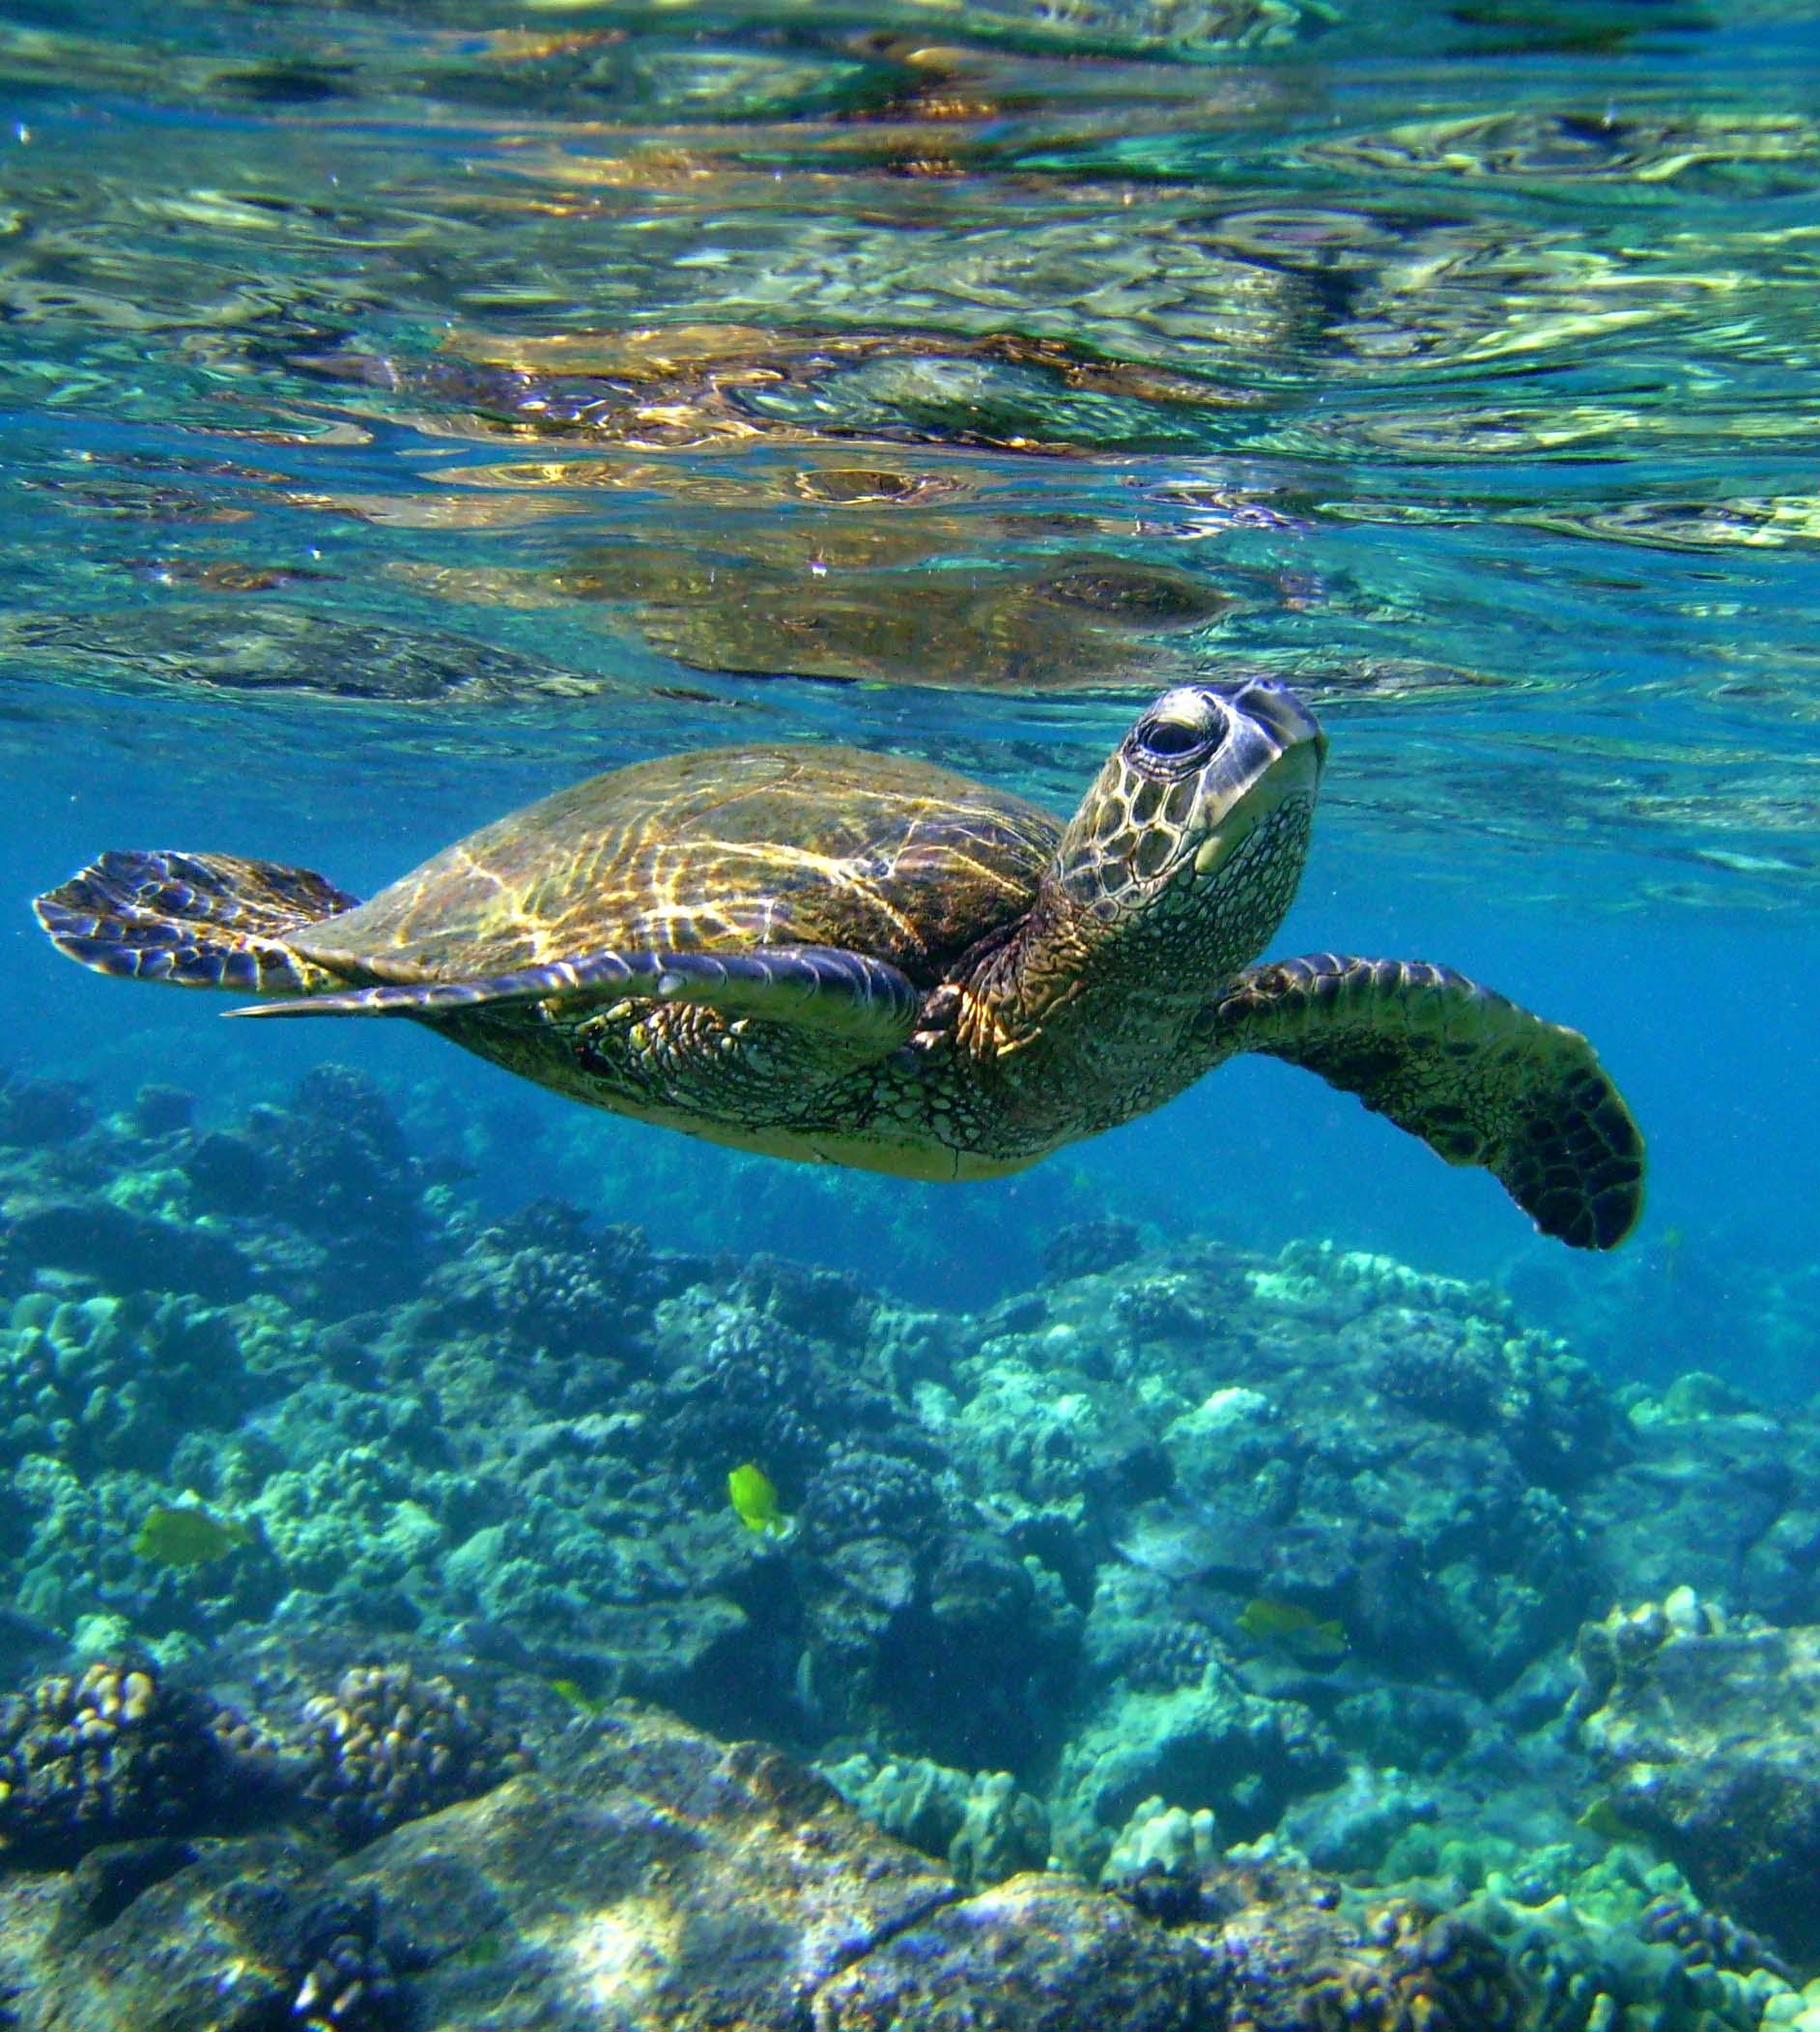 48+ Free Sea Turtle Wallpaper Backgrounds on WallpaperSafari